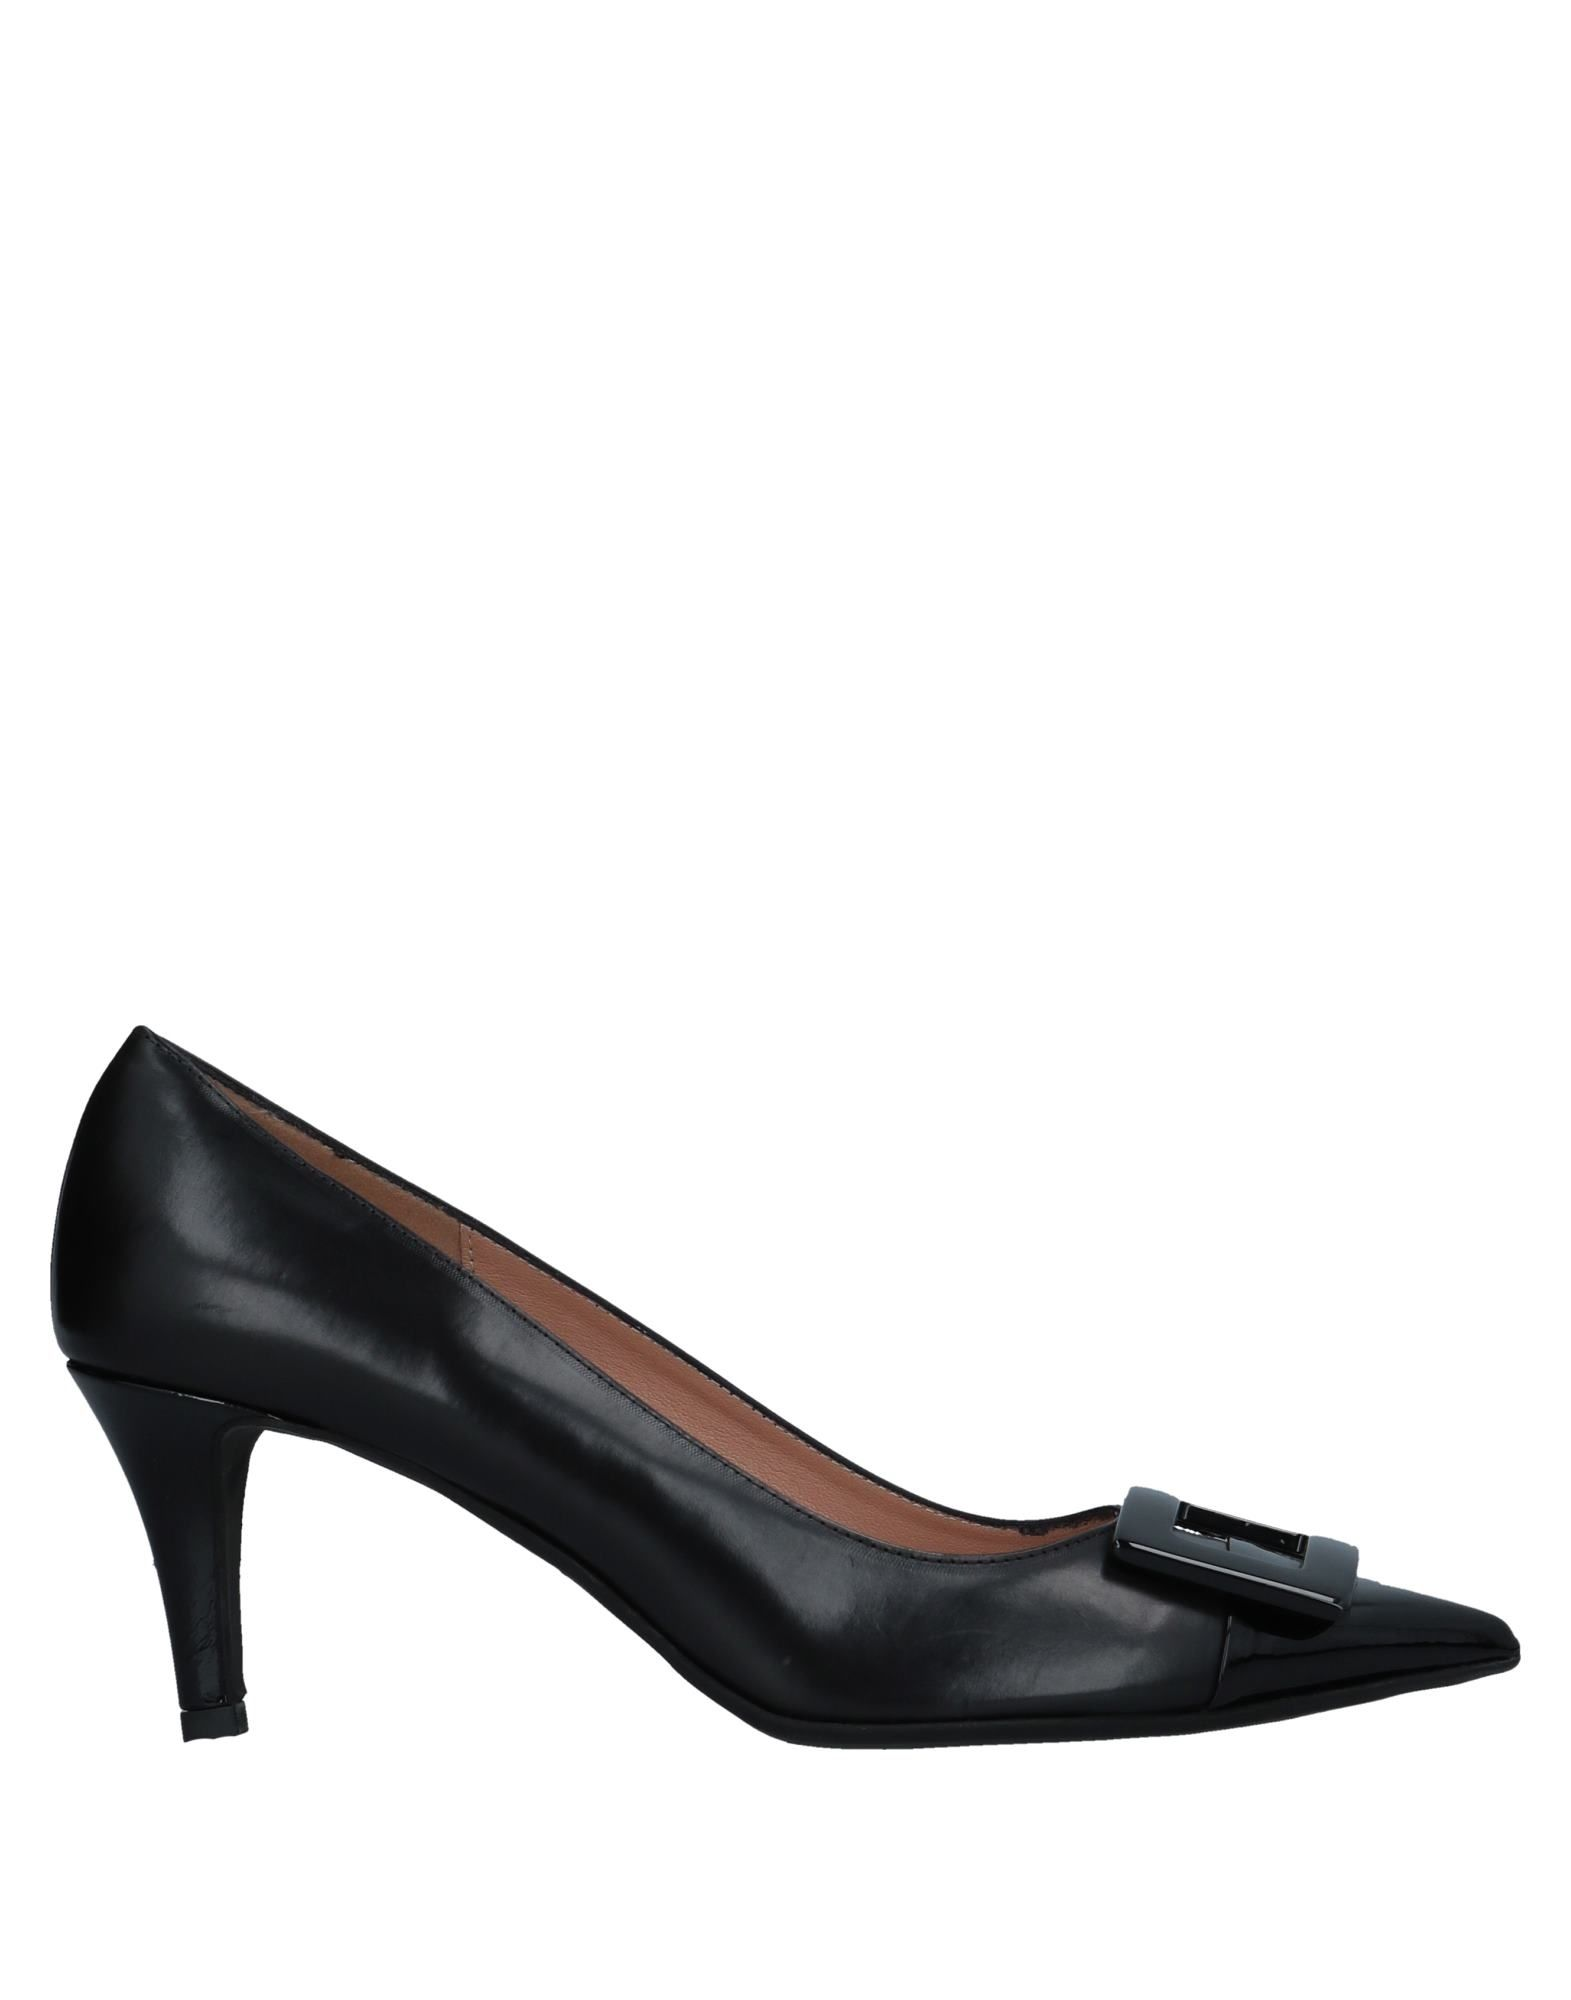 Andrea Morando Pumps Qualität Damen  11525287SP Gute Qualität Pumps beliebte Schuhe 8a4de4